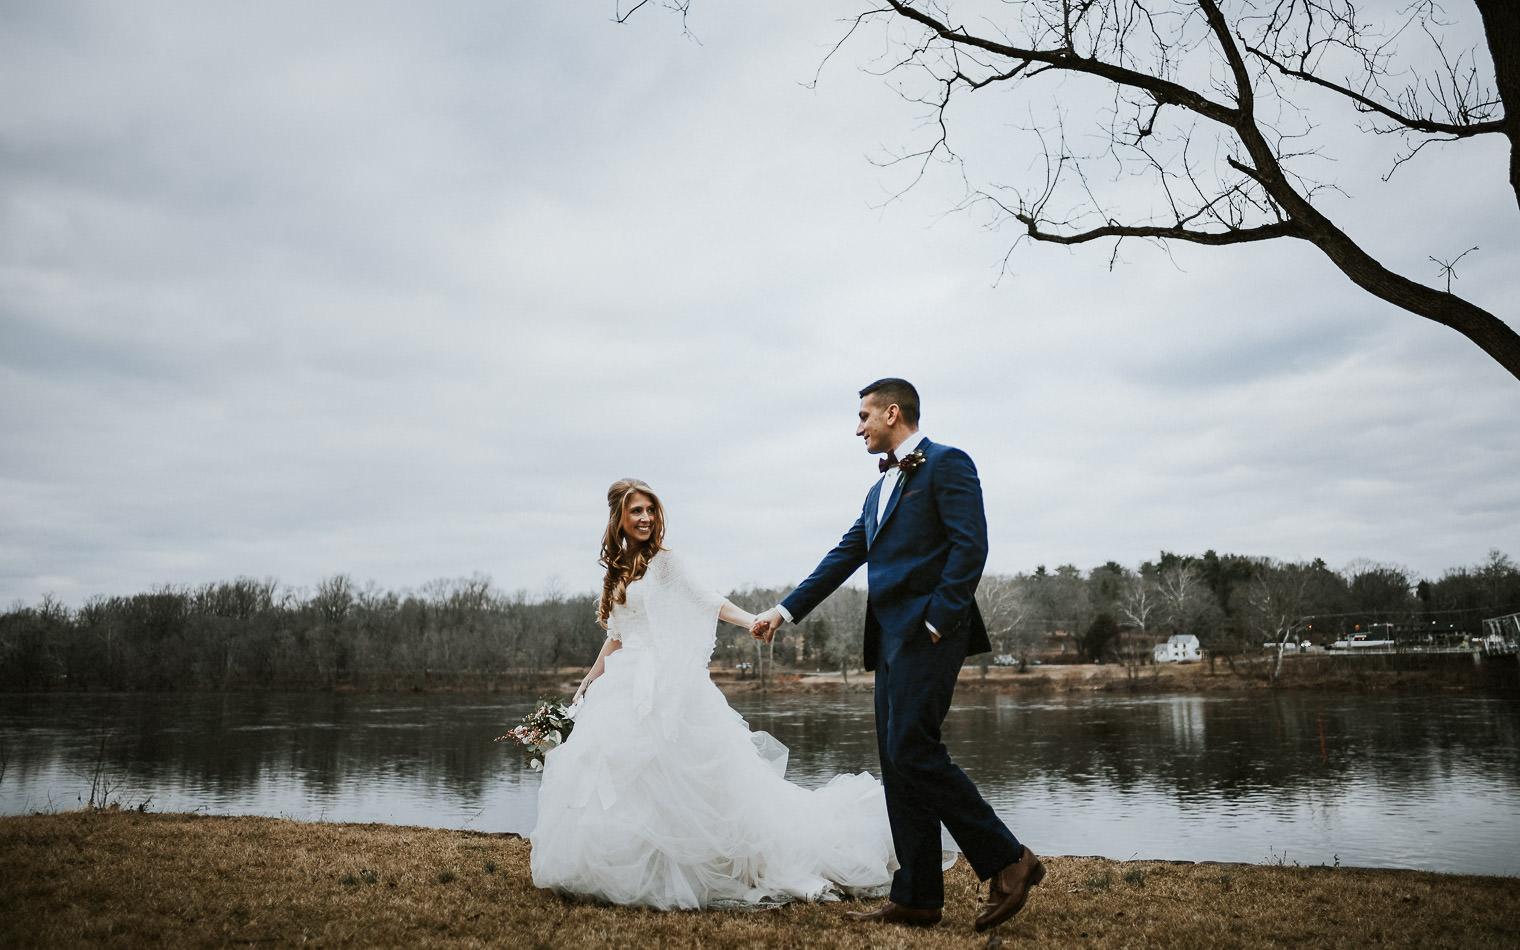 Jay-Cassario-Leica-Wedding-16.jpg